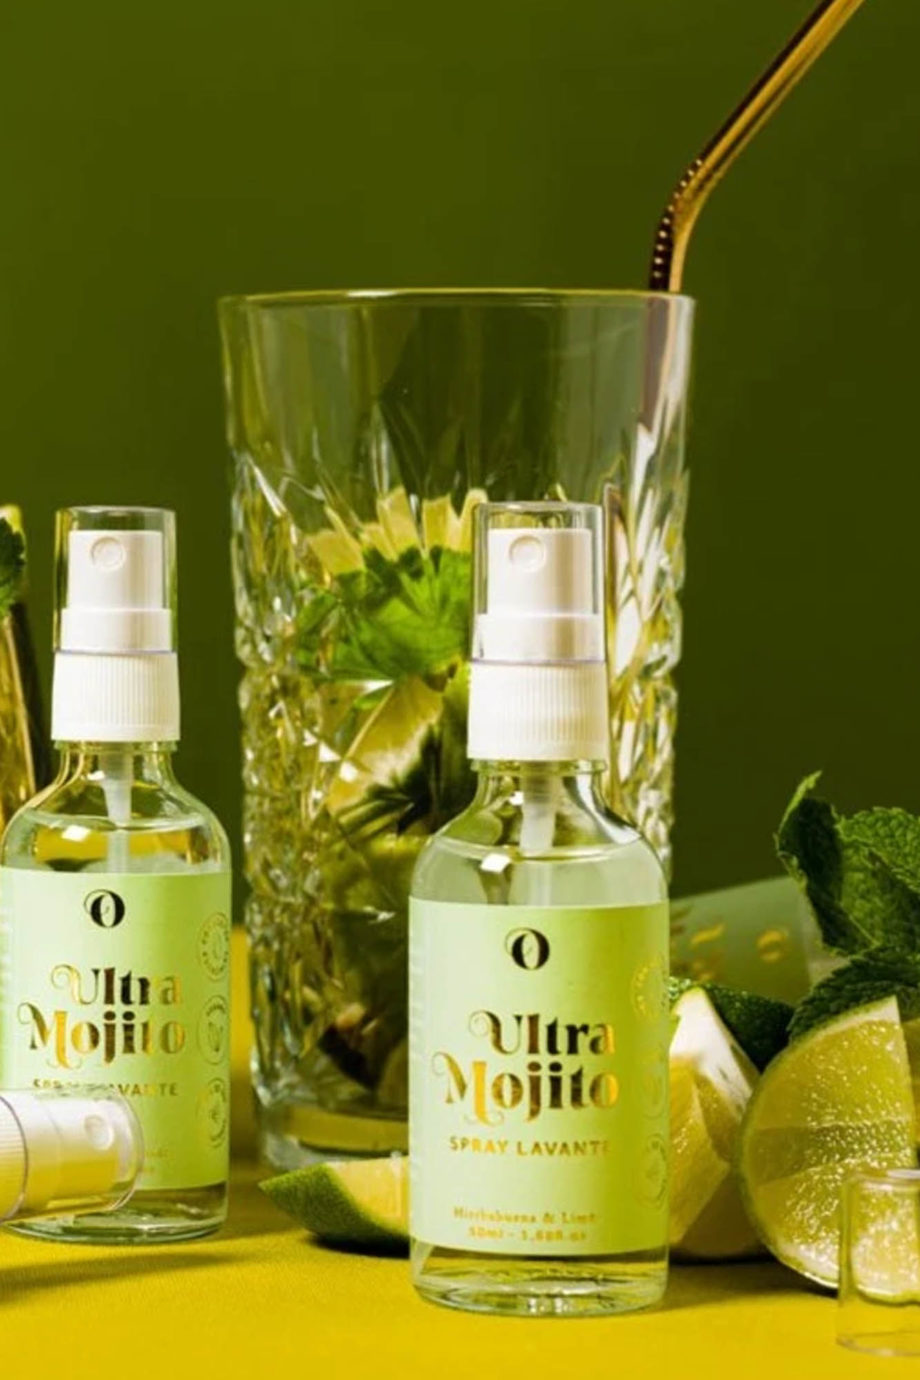 THE-SINGULAR-OLIVIA-spray-hidroalcoholico-ULTRA-MOJITO